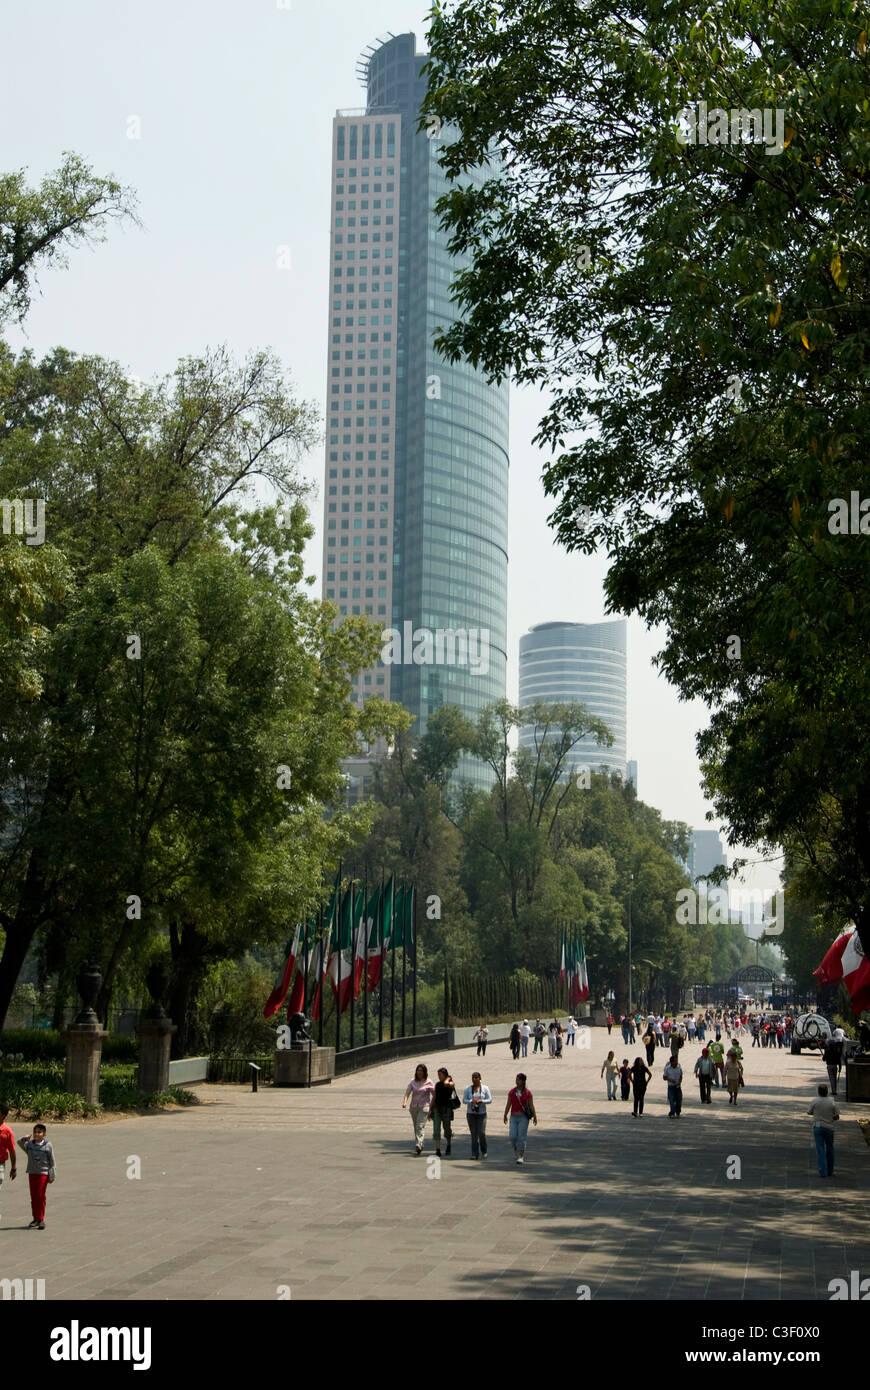 Mexico city. Chapultepec Park. Juventud Heroica avenue. - Stock Image